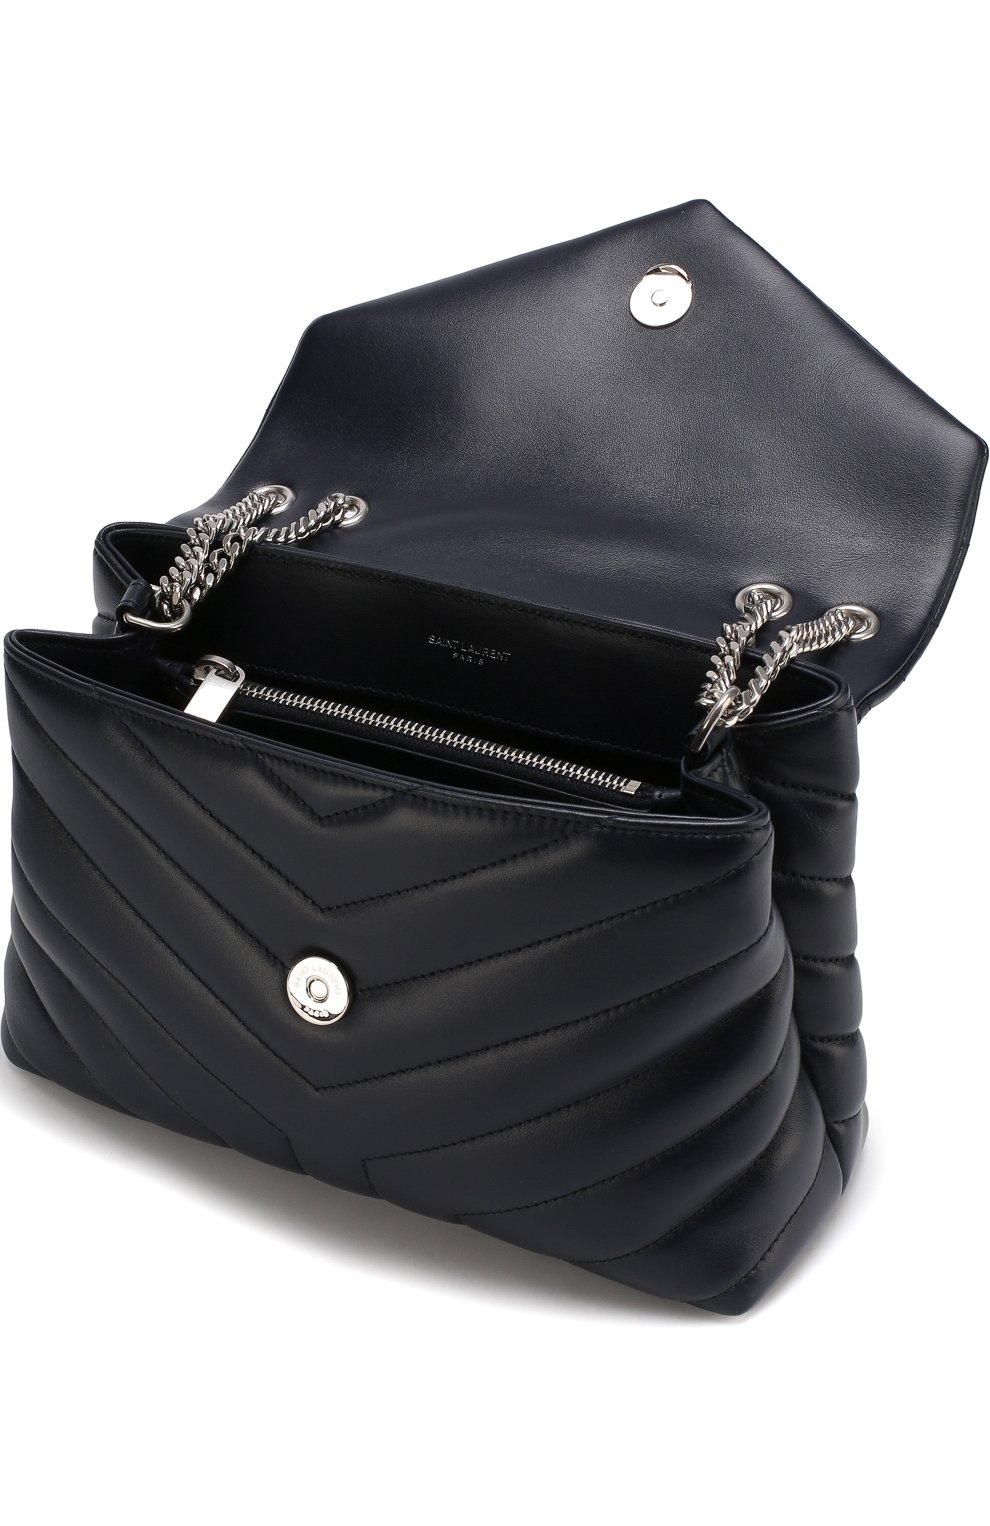 Женская сумка monogram loulou small SAINT LAURENT синего цвета, арт. 494699/DV726 | Фото 4